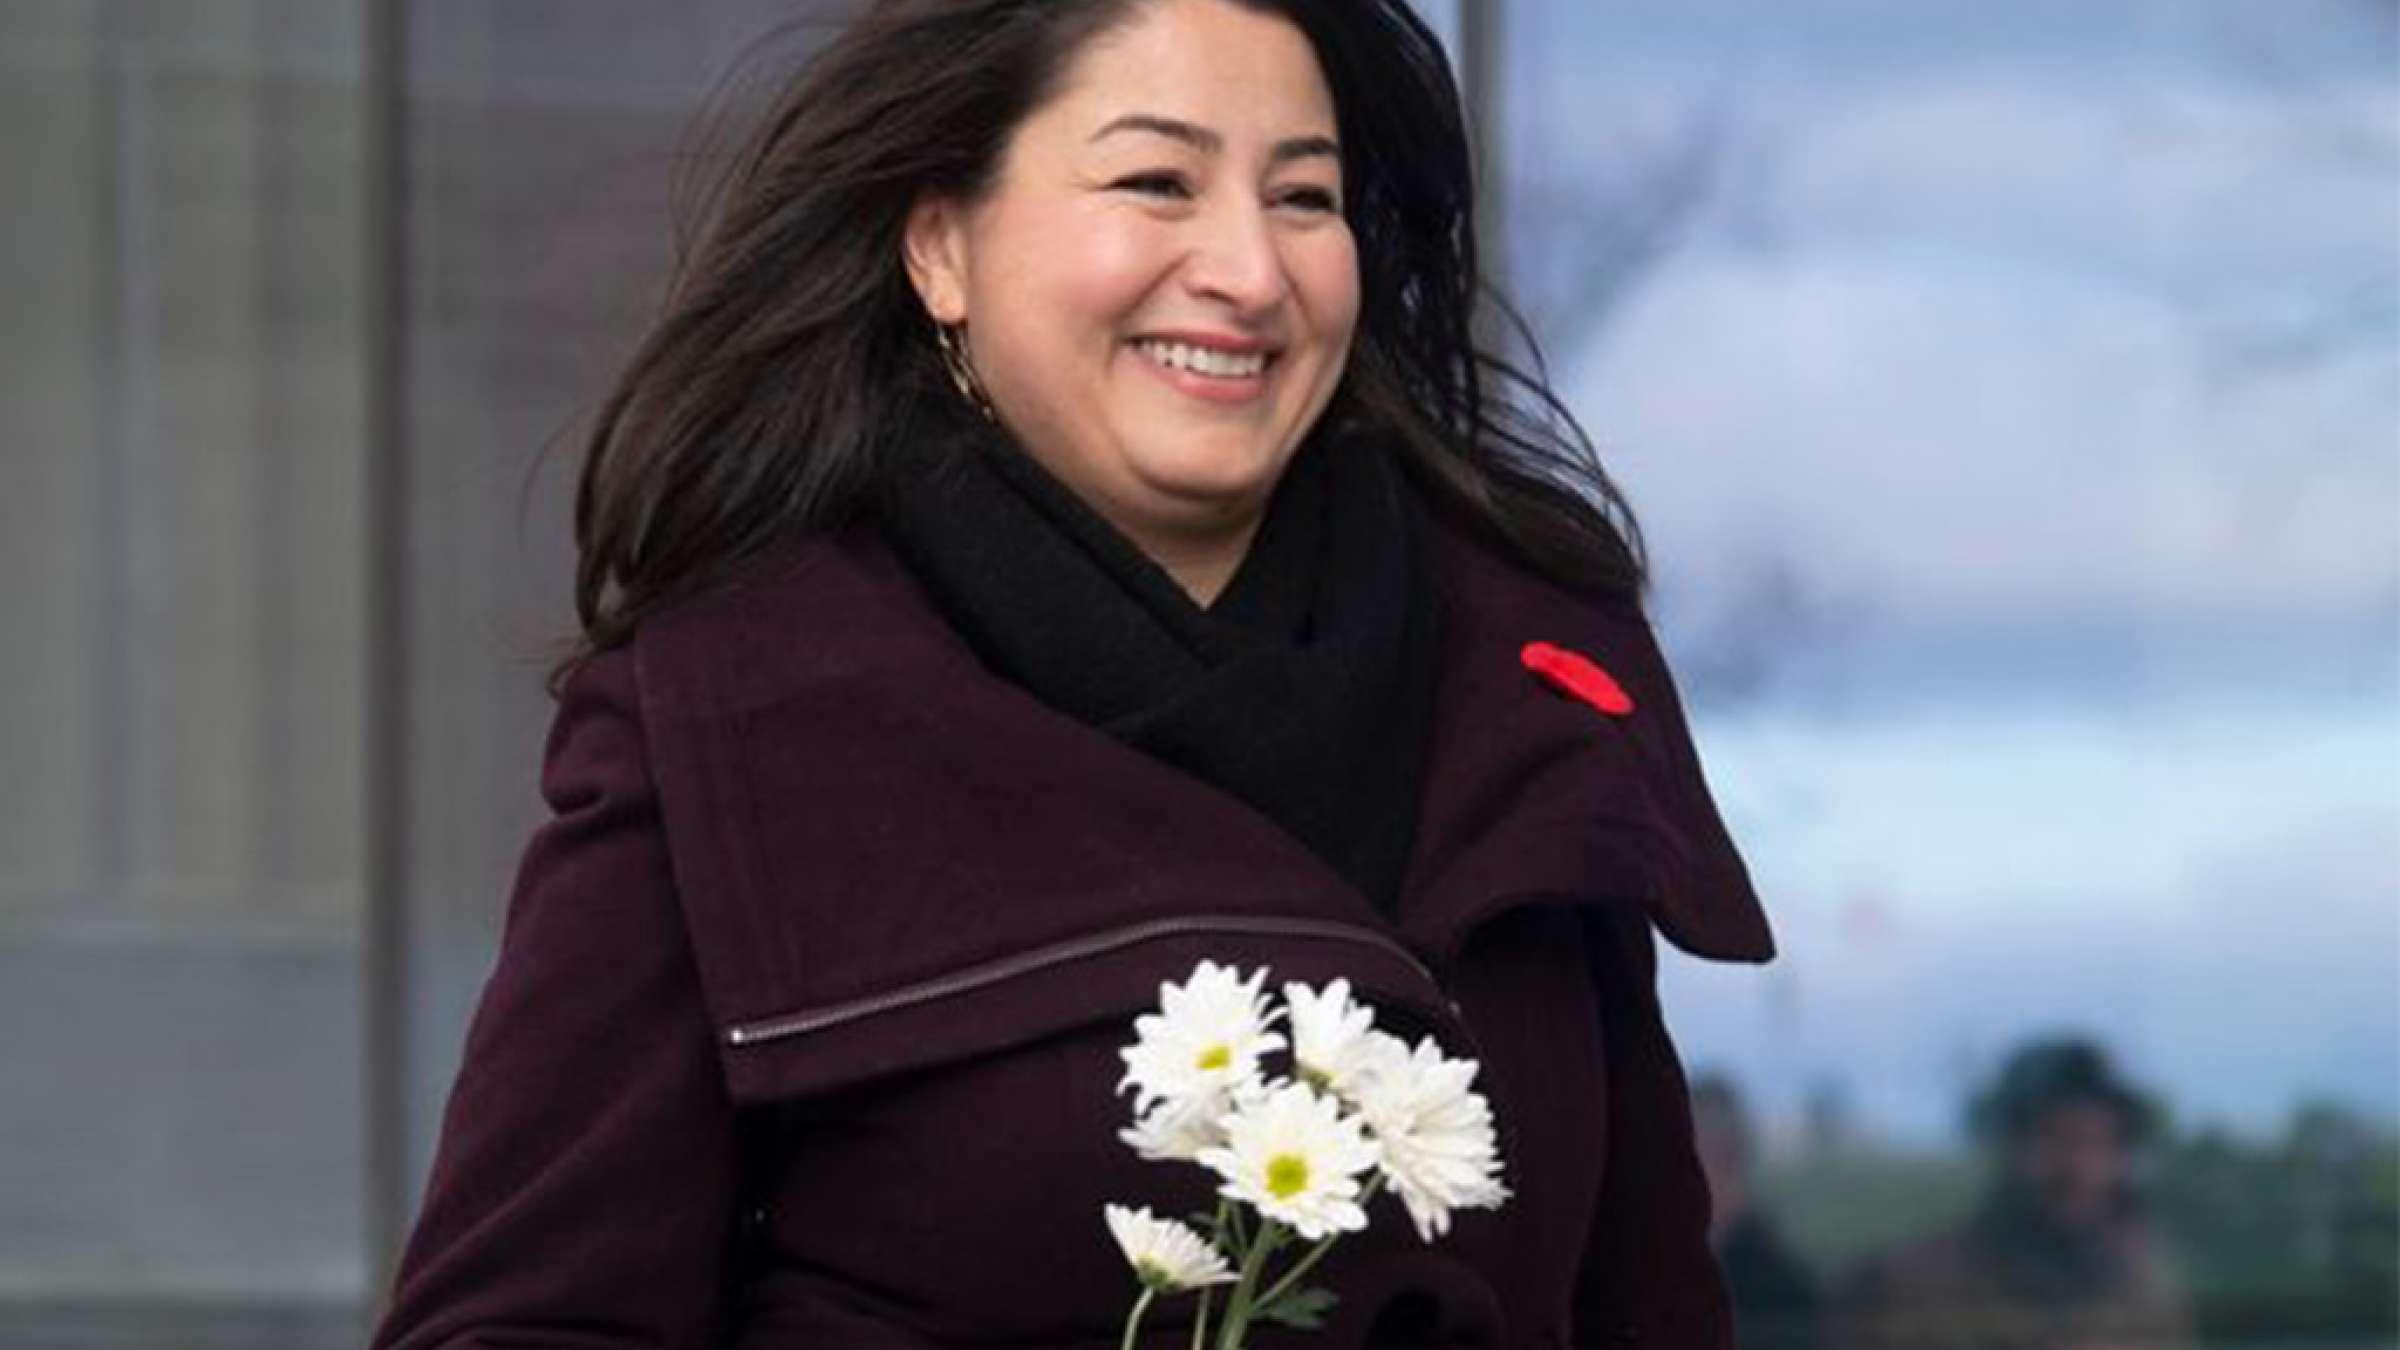 اخبار-کانادا-مریم-منصف-نامزد-کرد